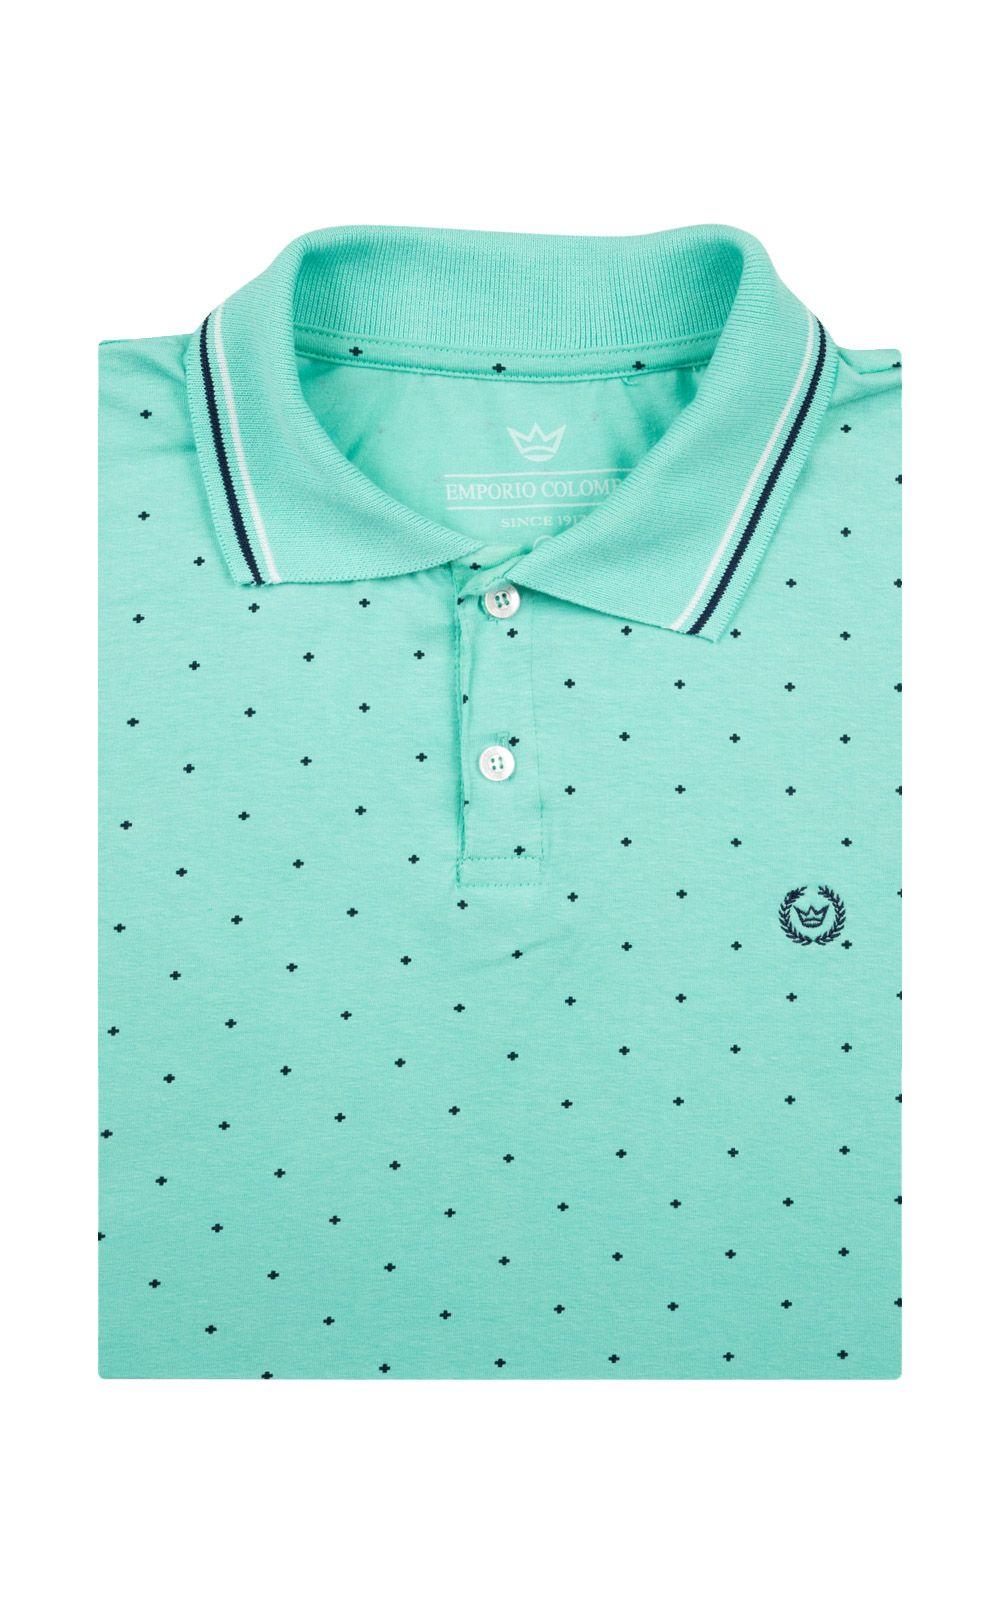 Foto 4 - Camisa Polo Masculina Verde Estampada